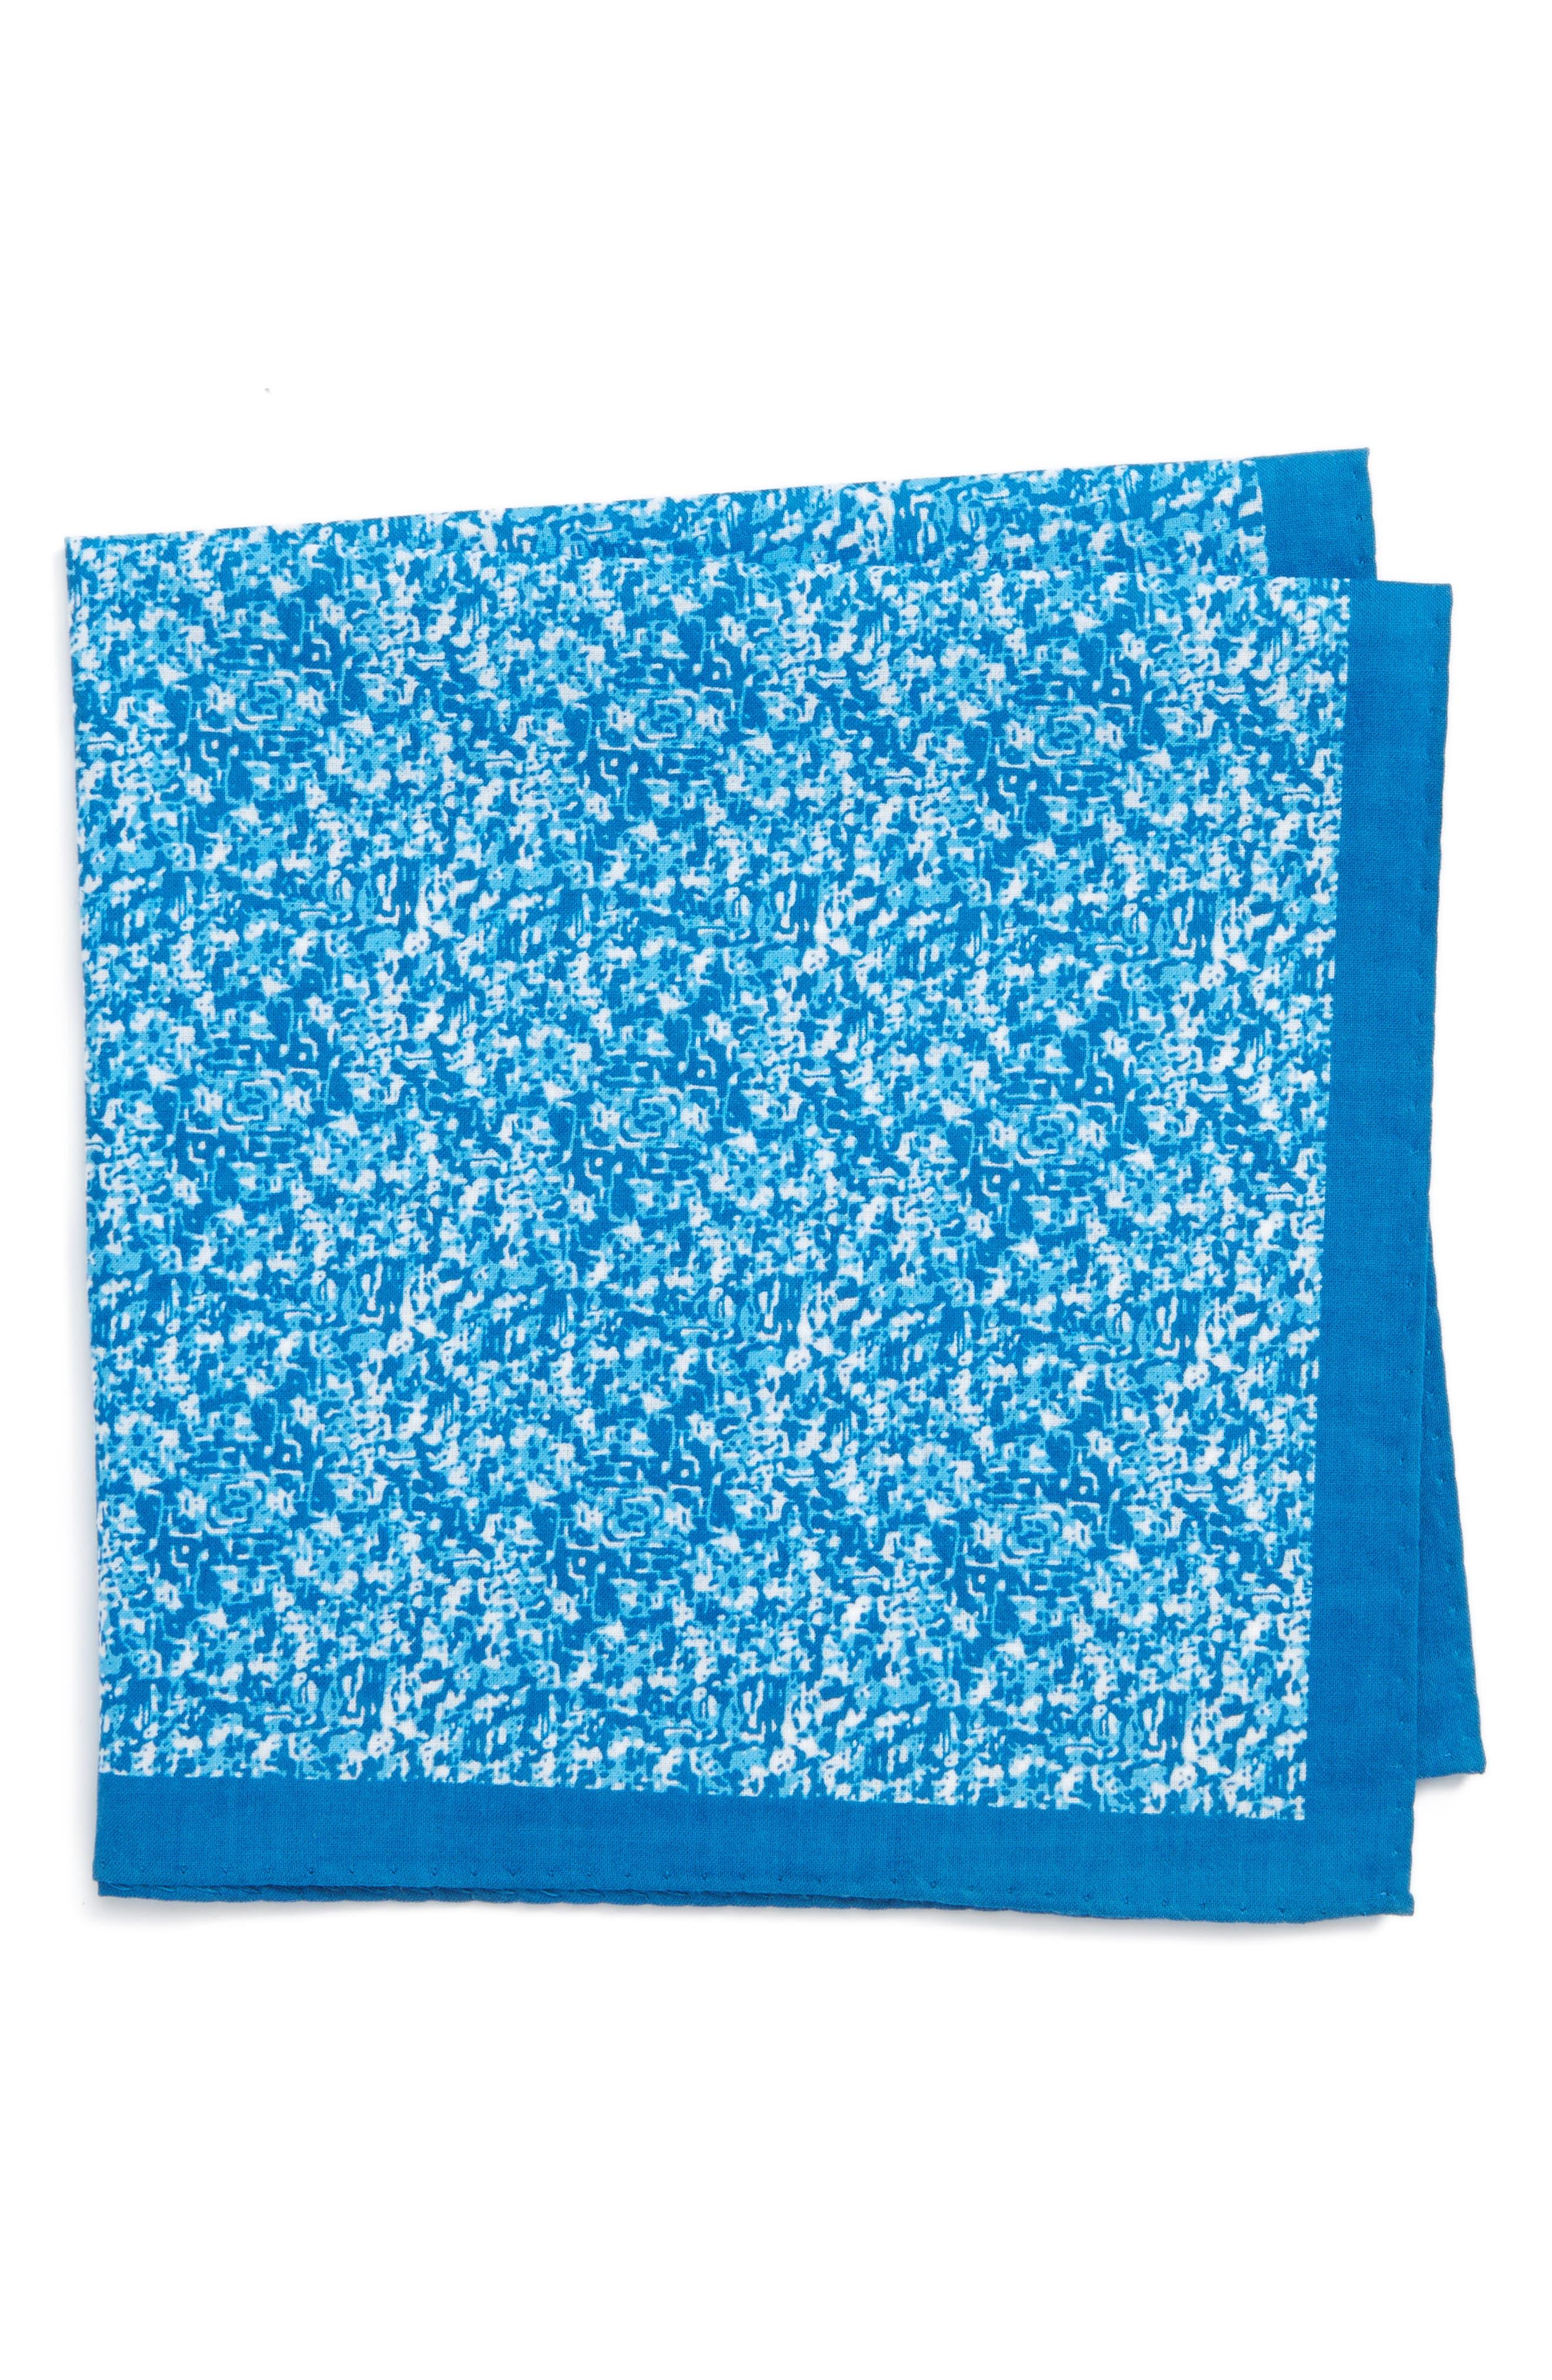 Main Image - Nordstrom Men's Shop Panso Print Cotton Pocket Square